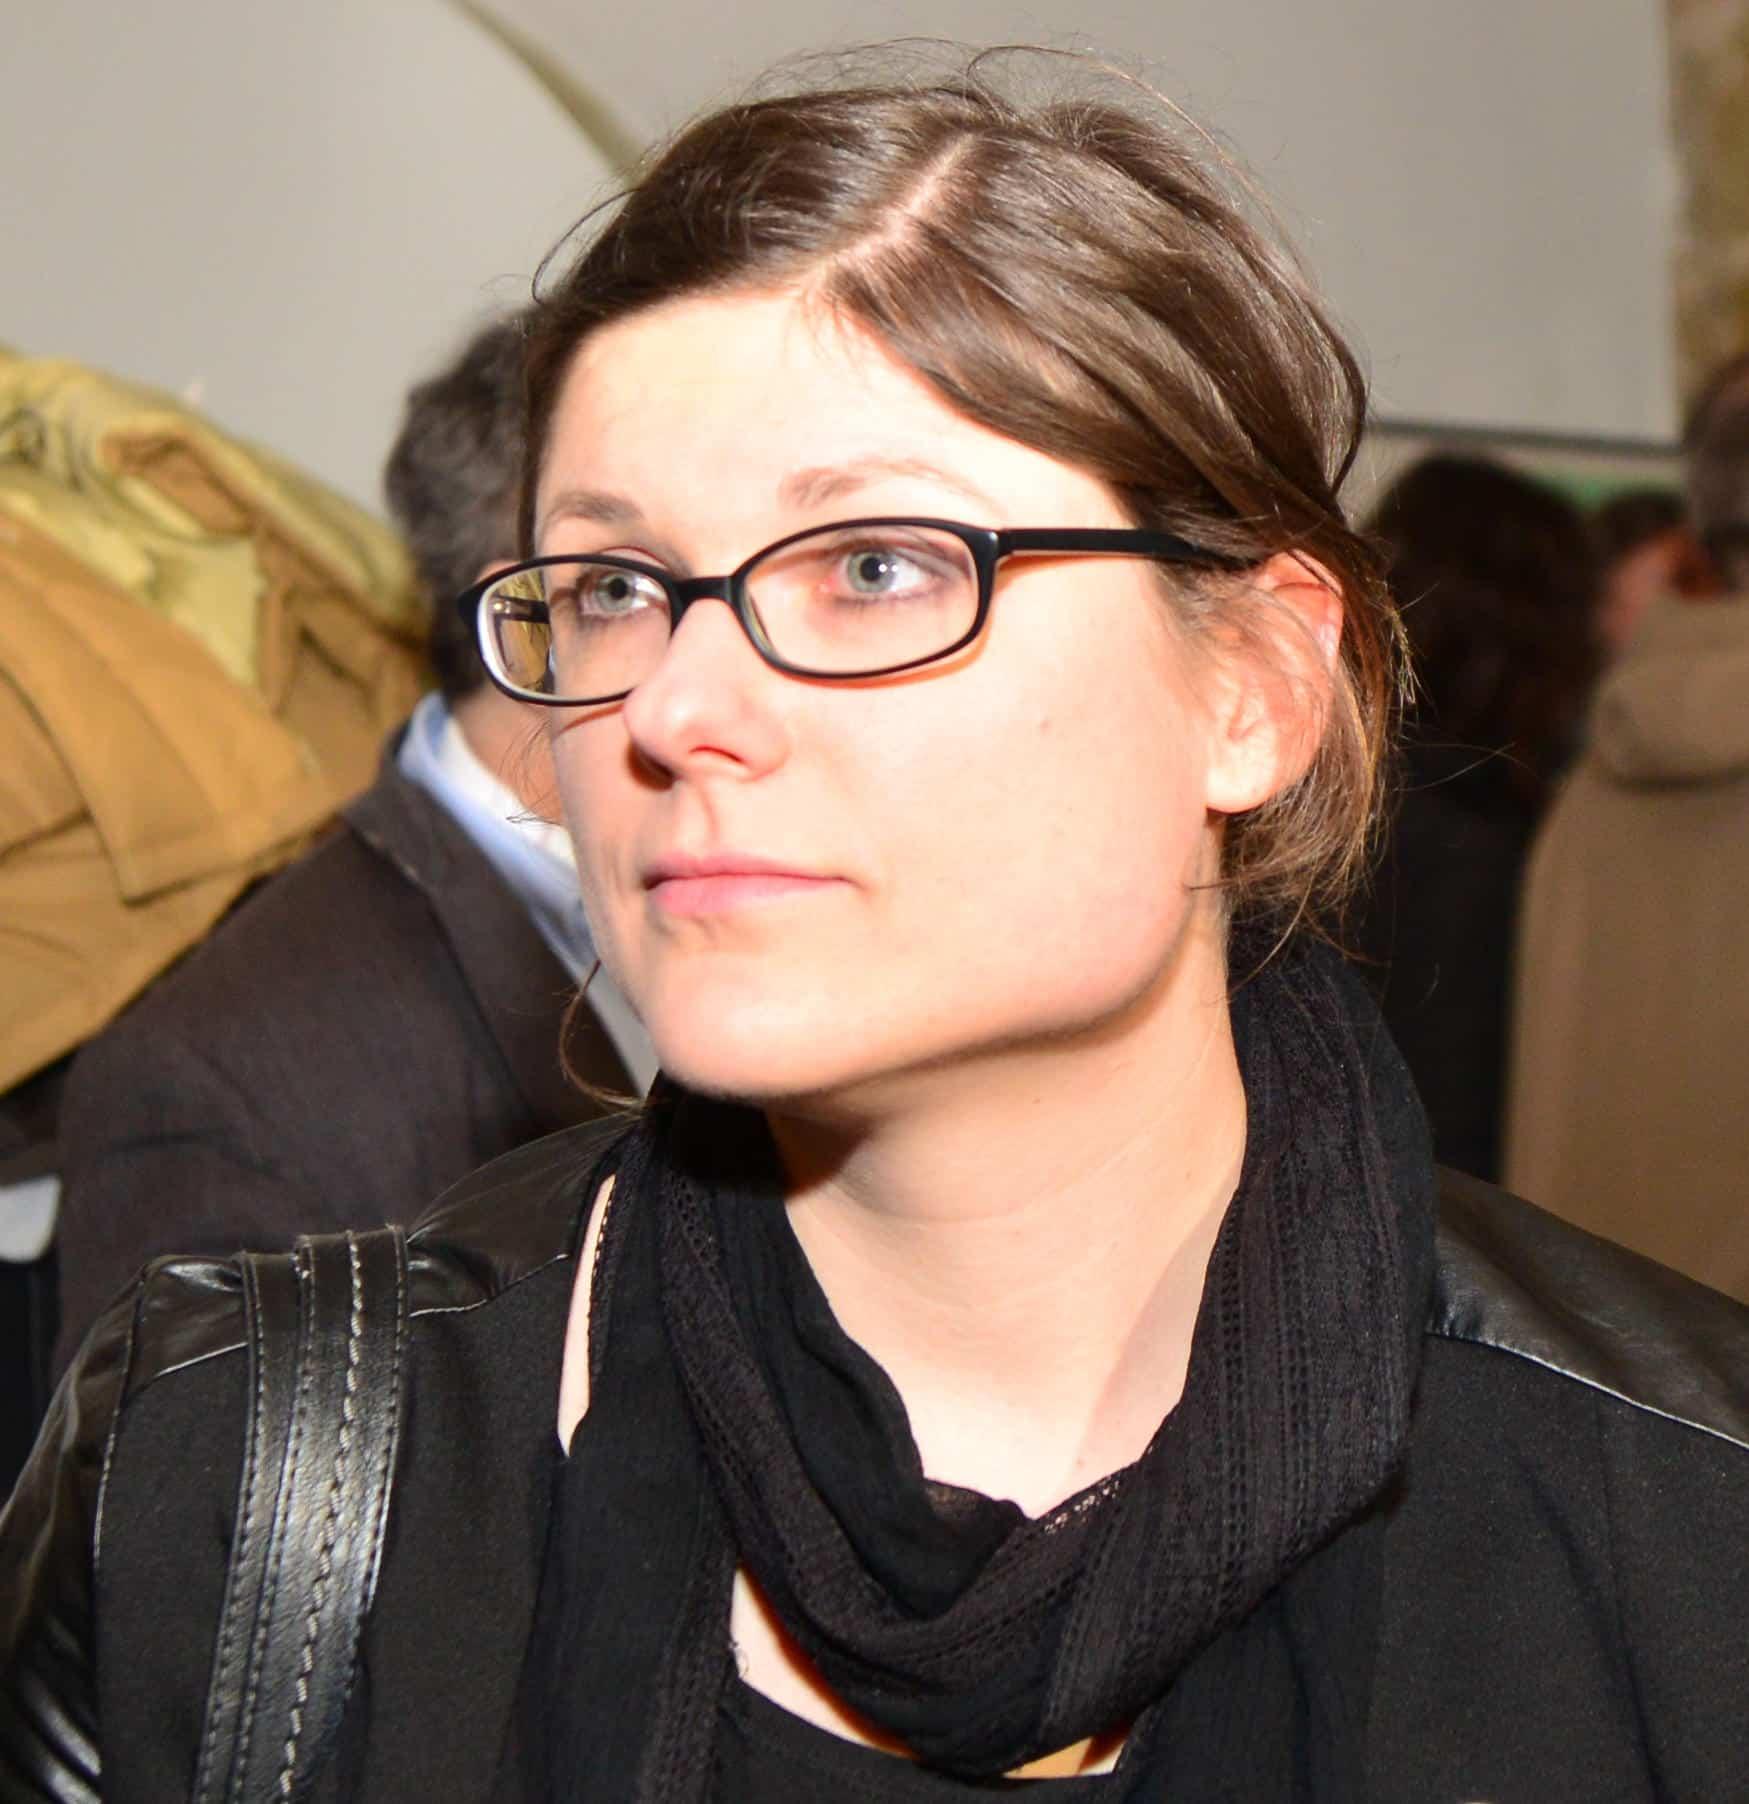 Im Kreuzfeuer der Mitkoalittionäre: Tina Lorenz. Foto: Archiv/ Staudinger